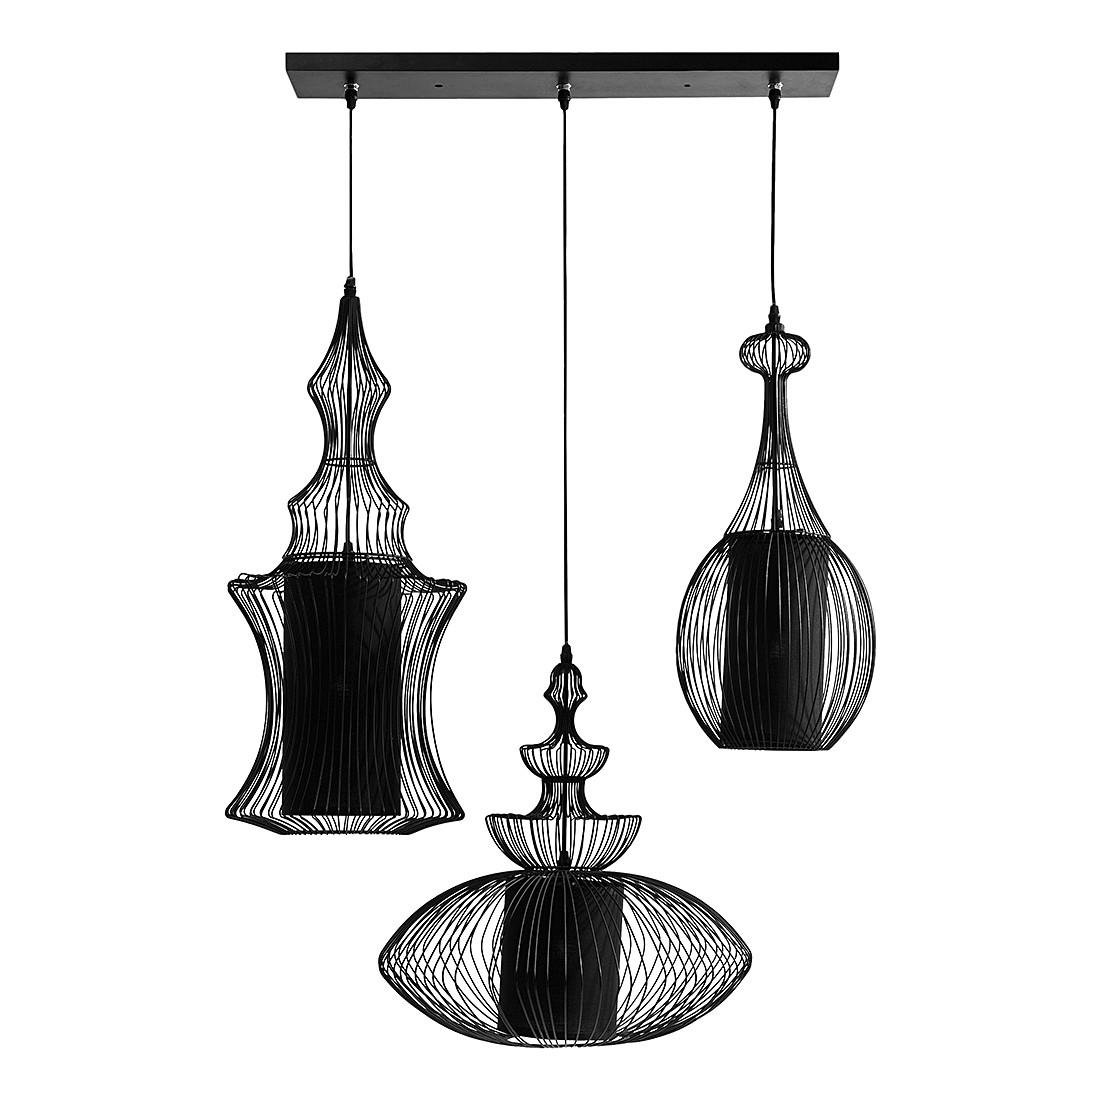 EEK A++, Pendelleuchte HL Swing Iron Tre – Metall/Kunststoff – 3-flammig, Kare Design jetzt kaufen